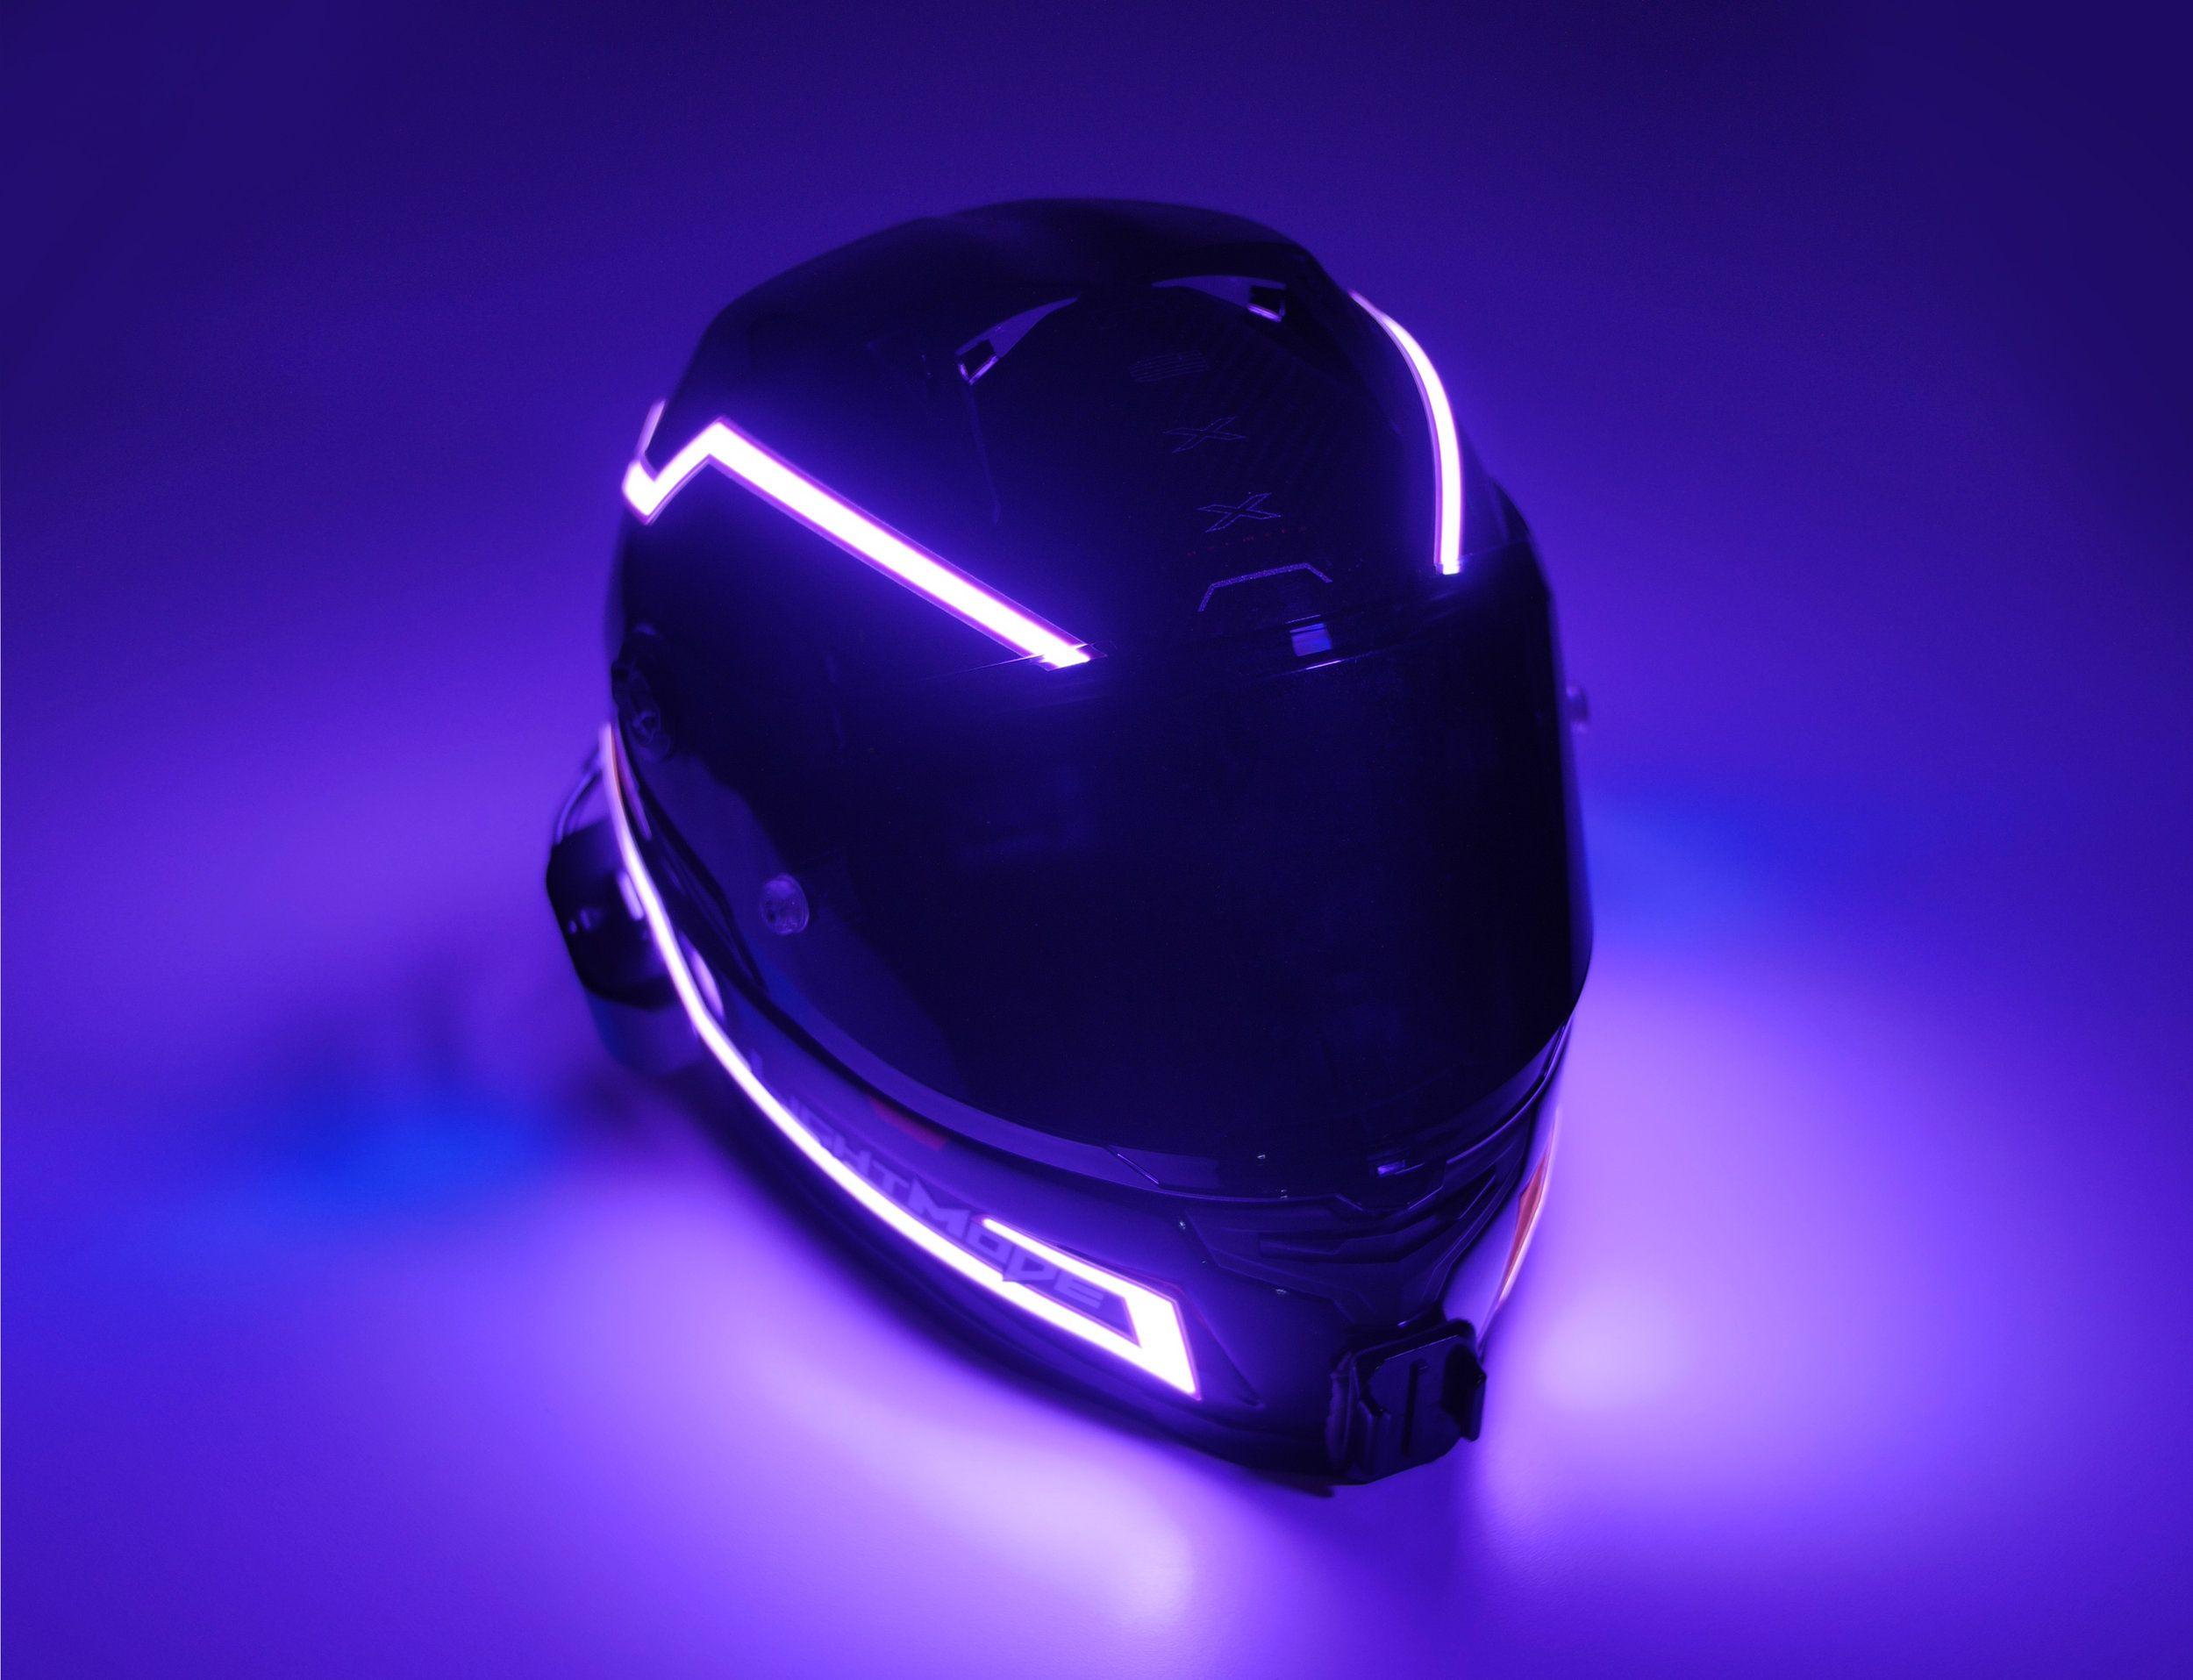 Color : Negro JiuRui Decoracion para Auto Motocicleta reflexiva del Coche a Prueba de Agua del Tanque Etiqueta calcoman/ías Maleta port/átil Casco con Logotipo para Super Tenere 1200 DX Sx XTZ